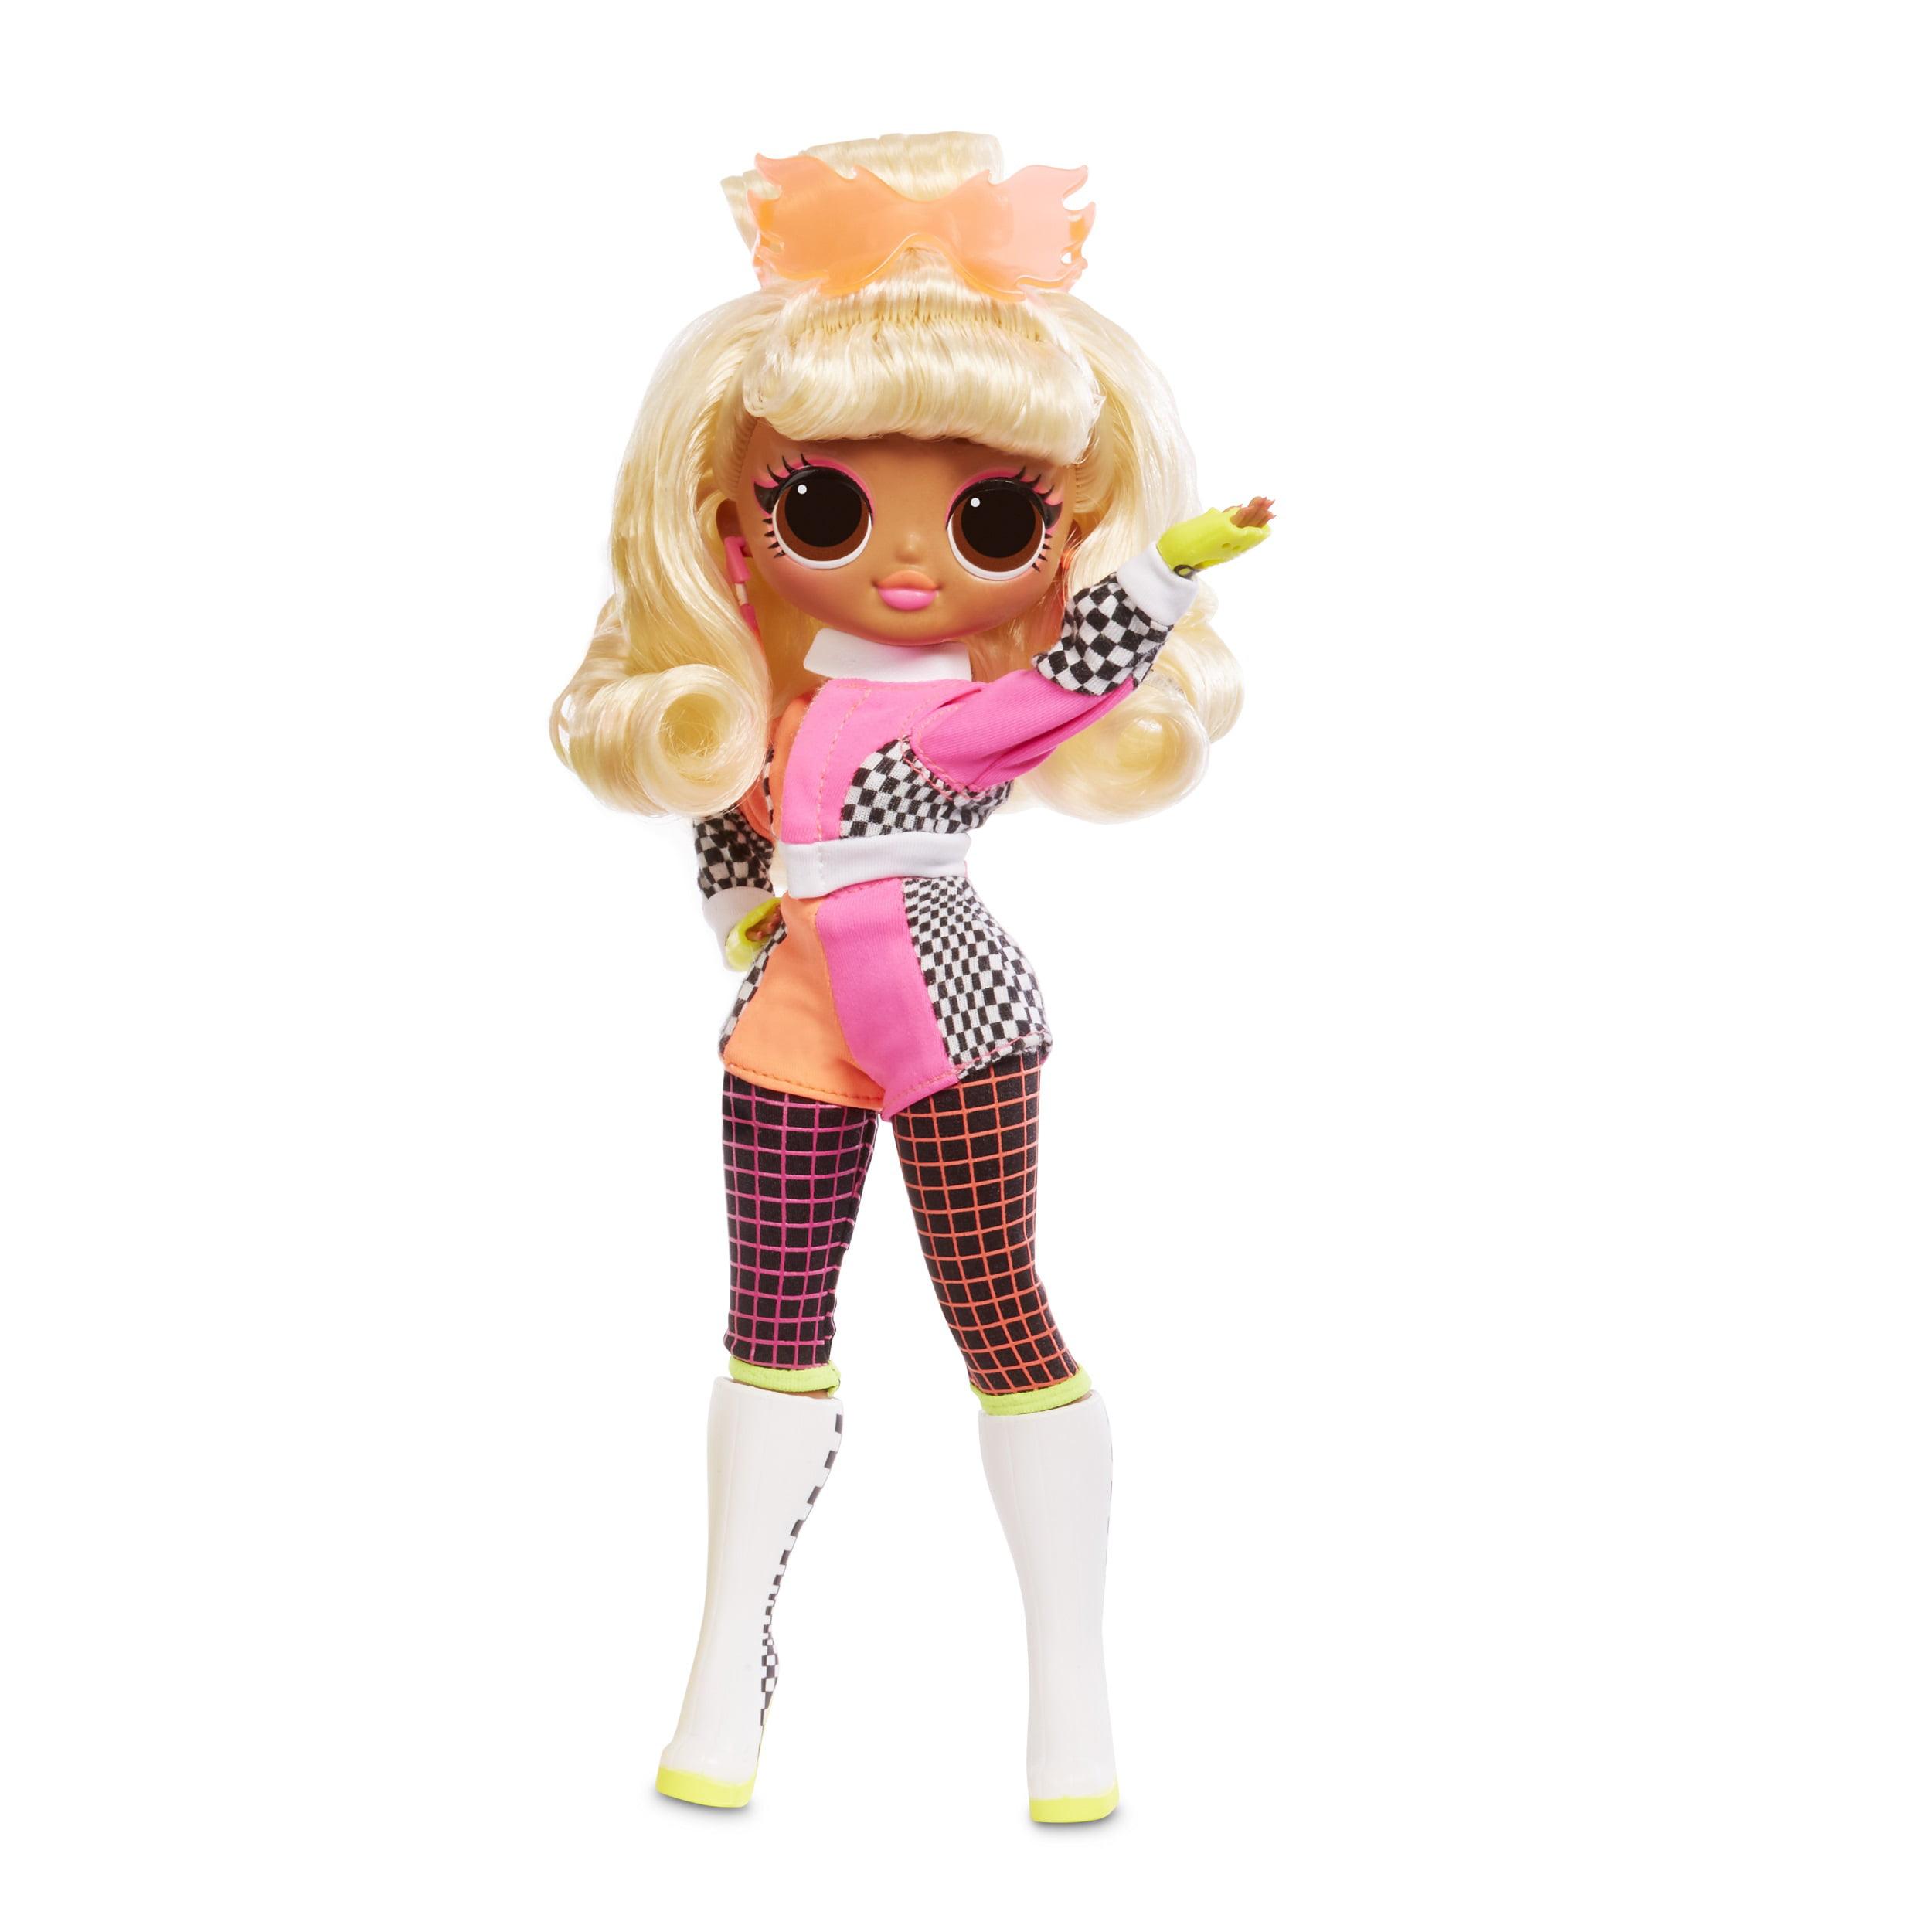 LOL Surprise Doll Metal Charm Bracelet Fashion Accessories for Girls